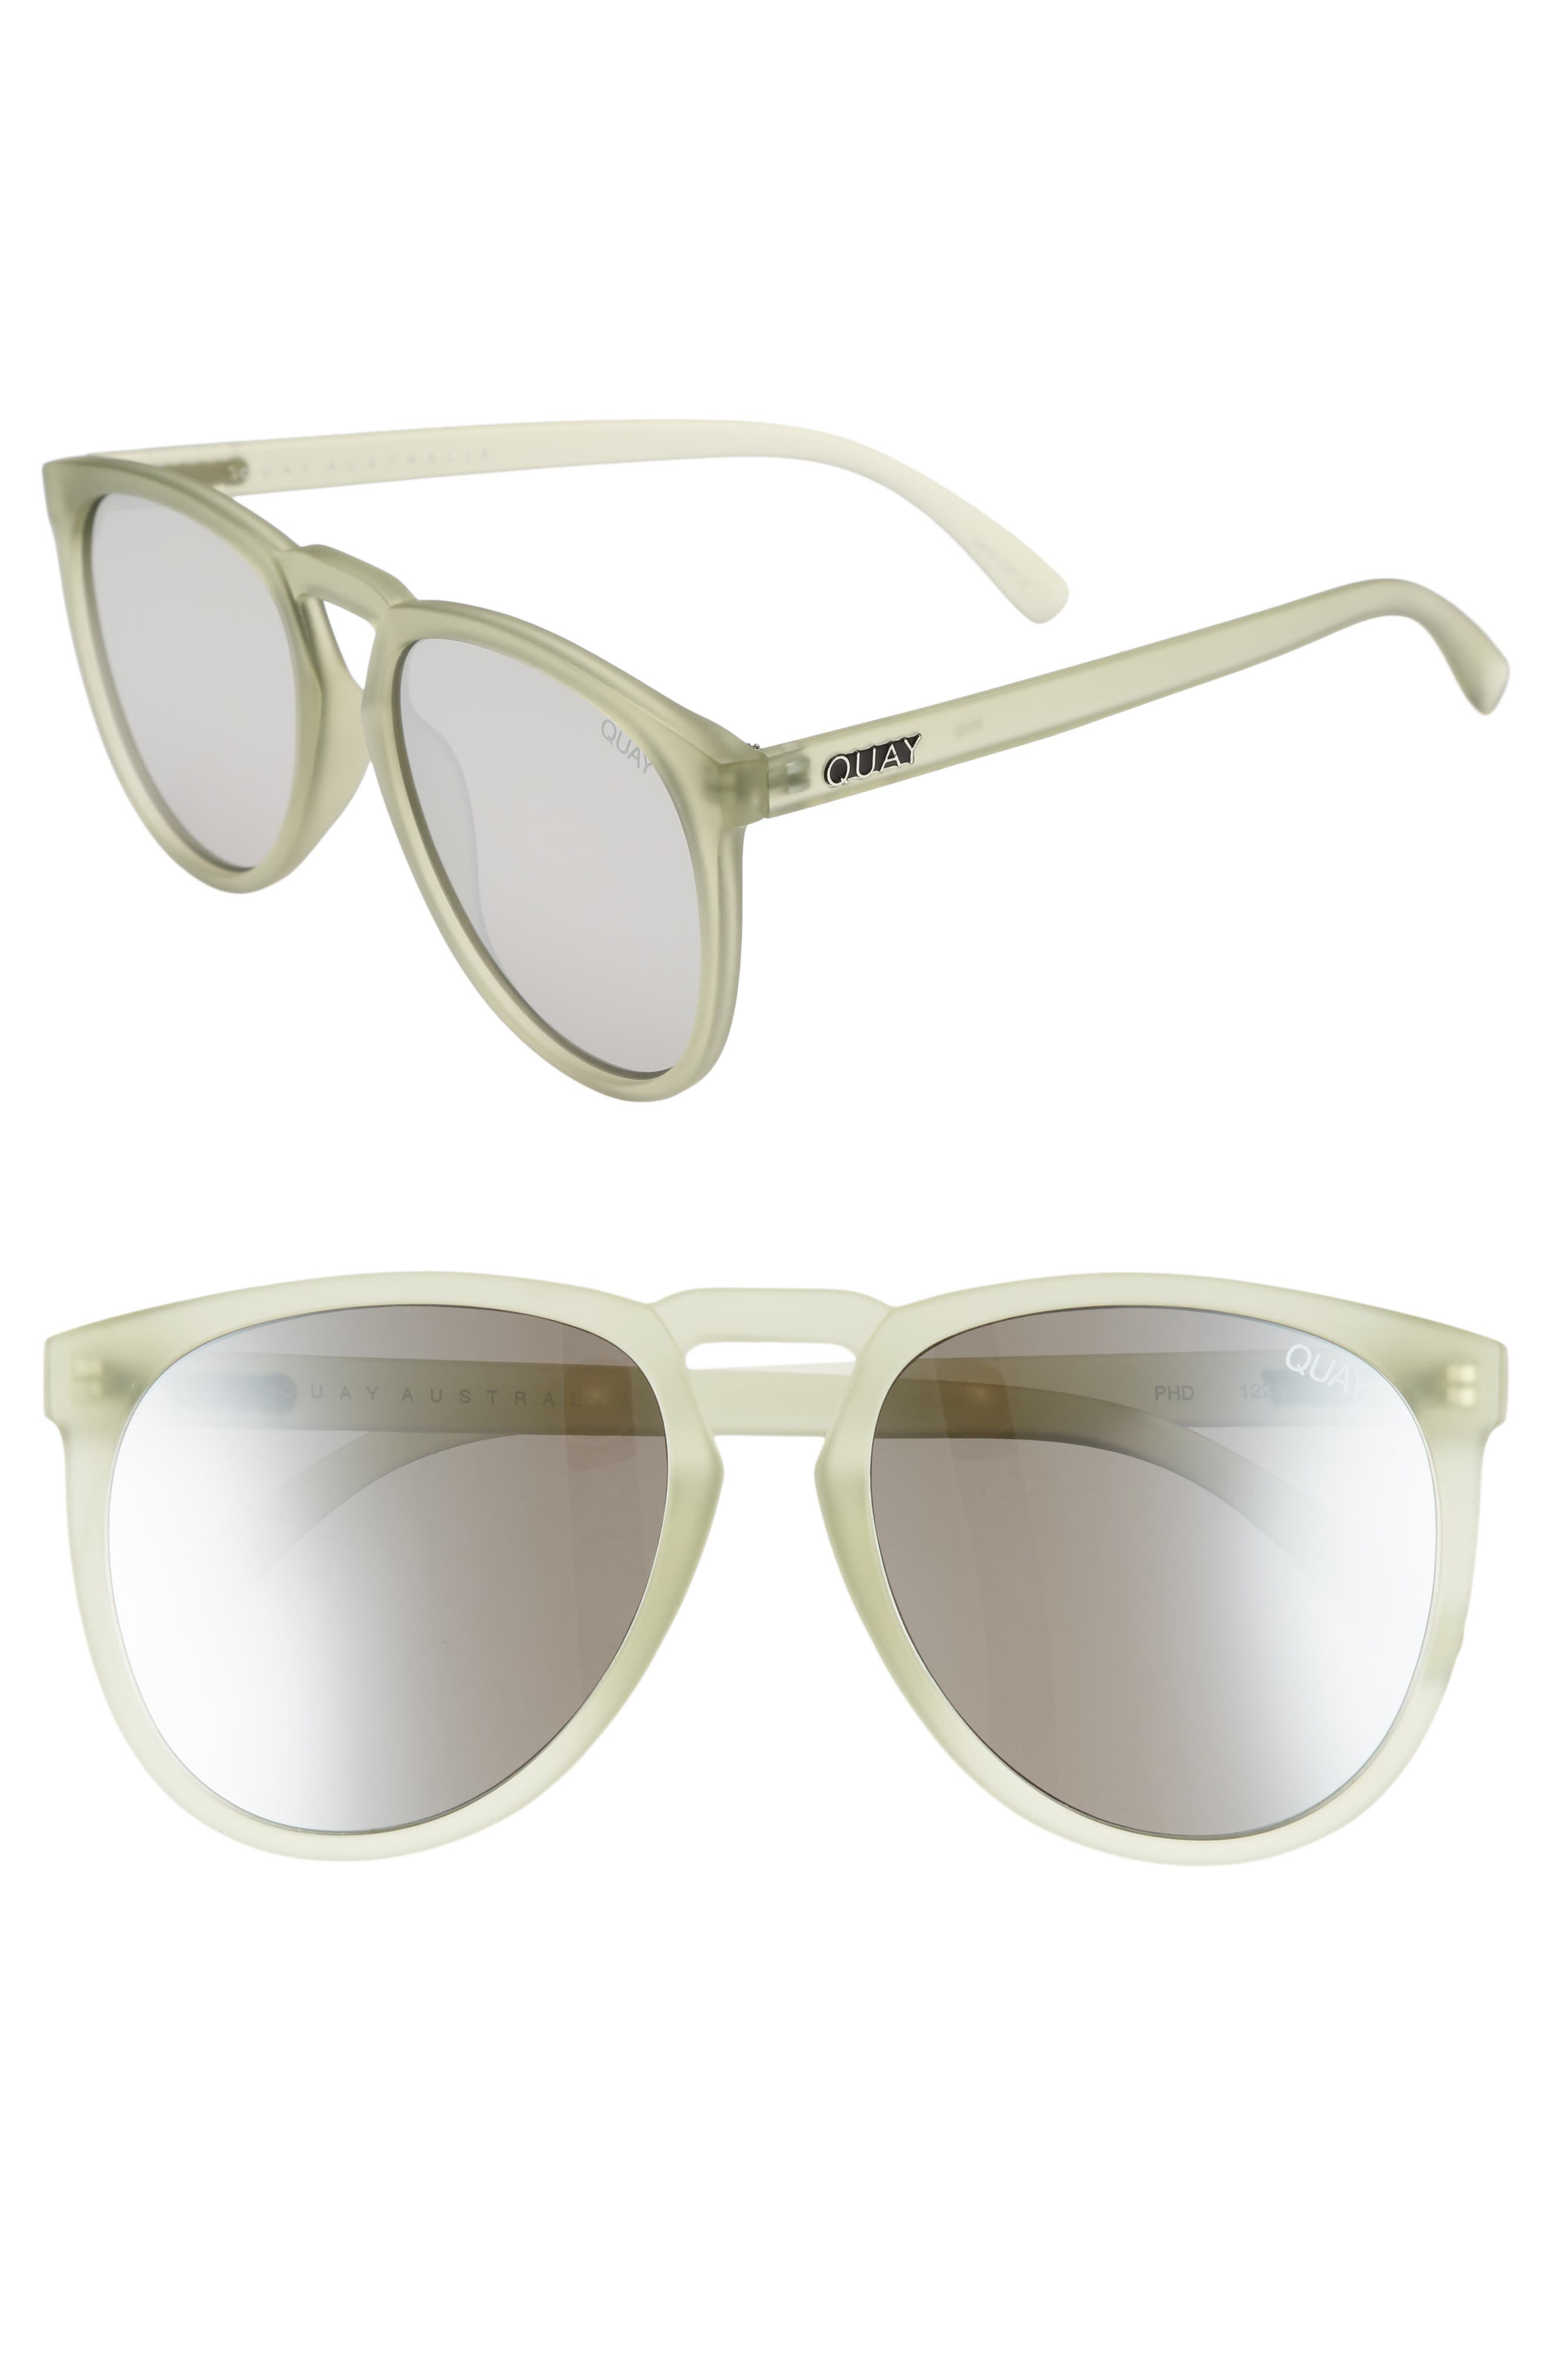 Quay Australia Phd 65Mm Sunglasses - Olive/ Silver